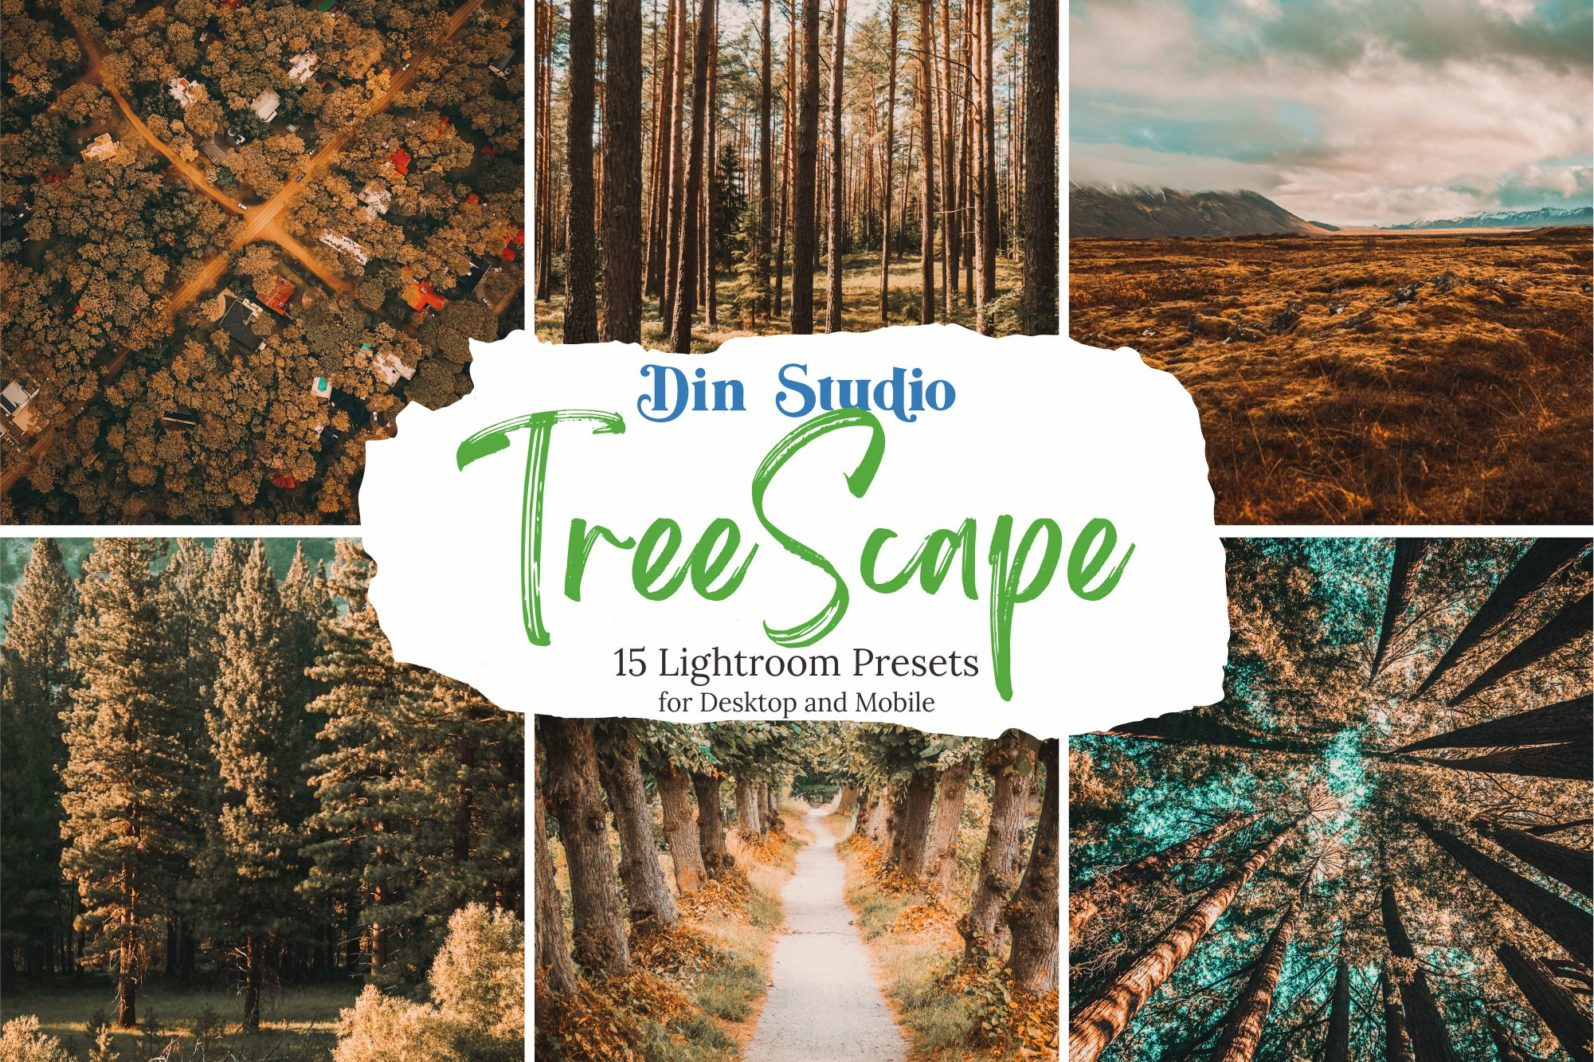 Treescape Lightroom Presets - Treescape Copy 1 -